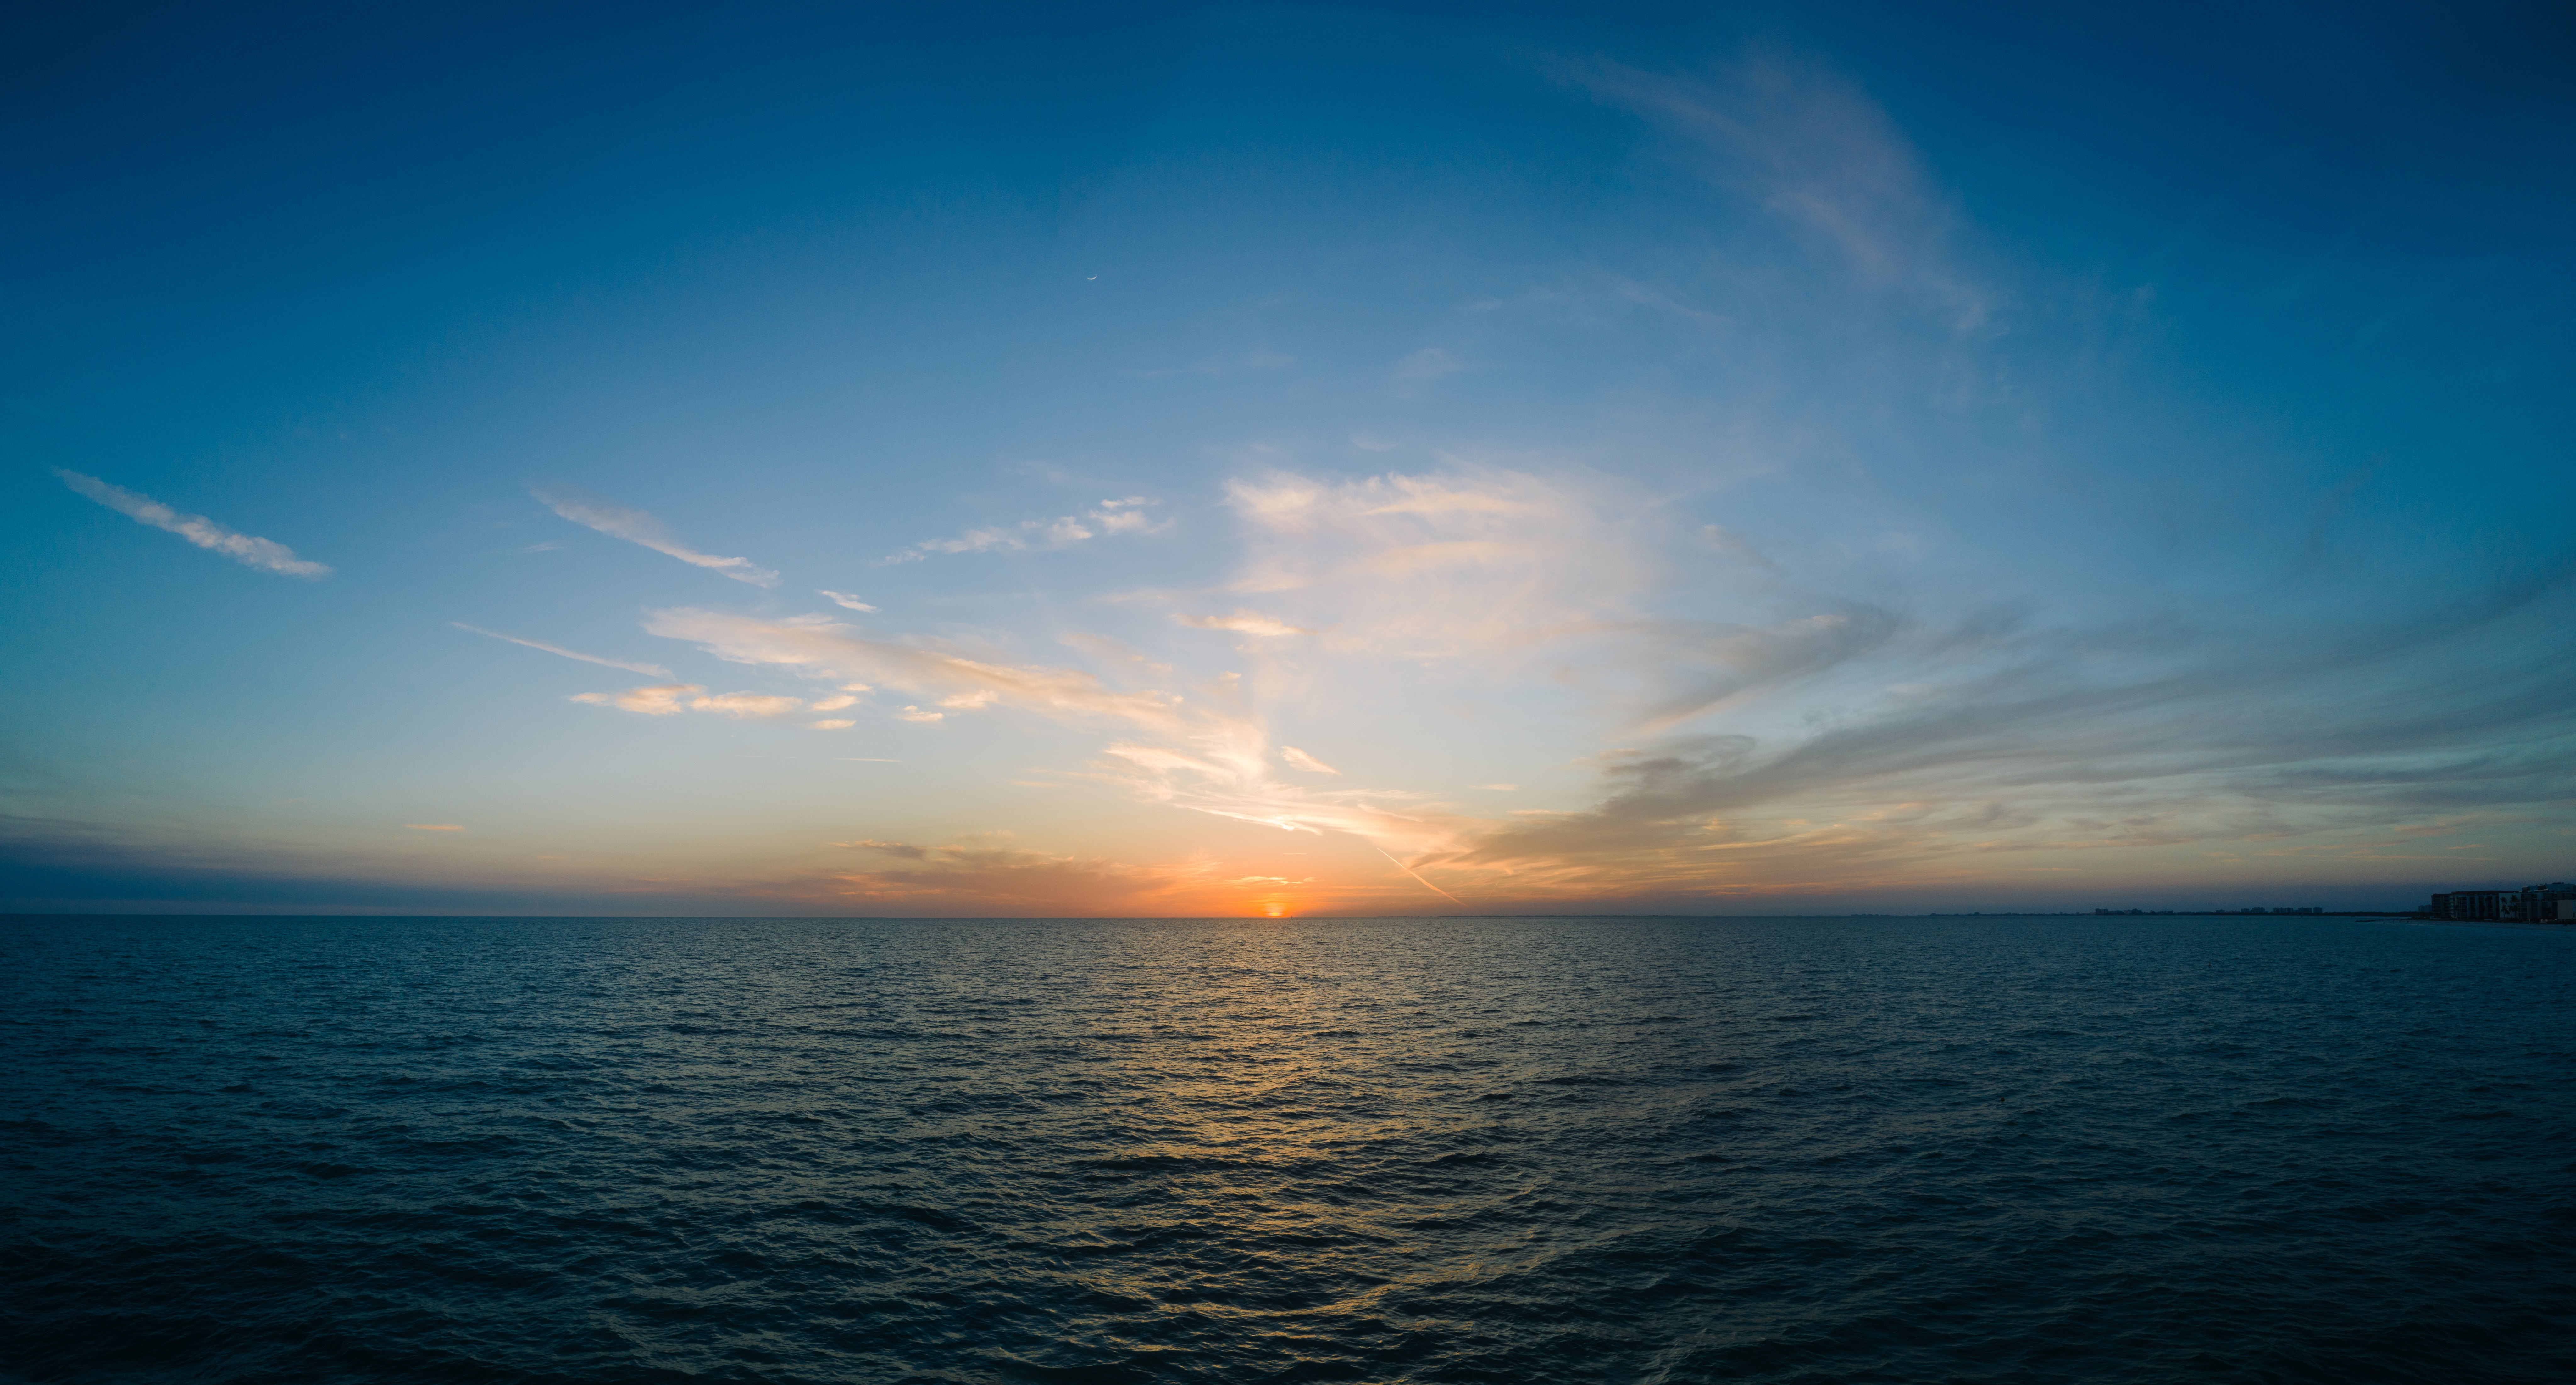 116384 скачать обои Природа, Море, Горизонт, Закат, Облака, Небо - заставки и картинки бесплатно